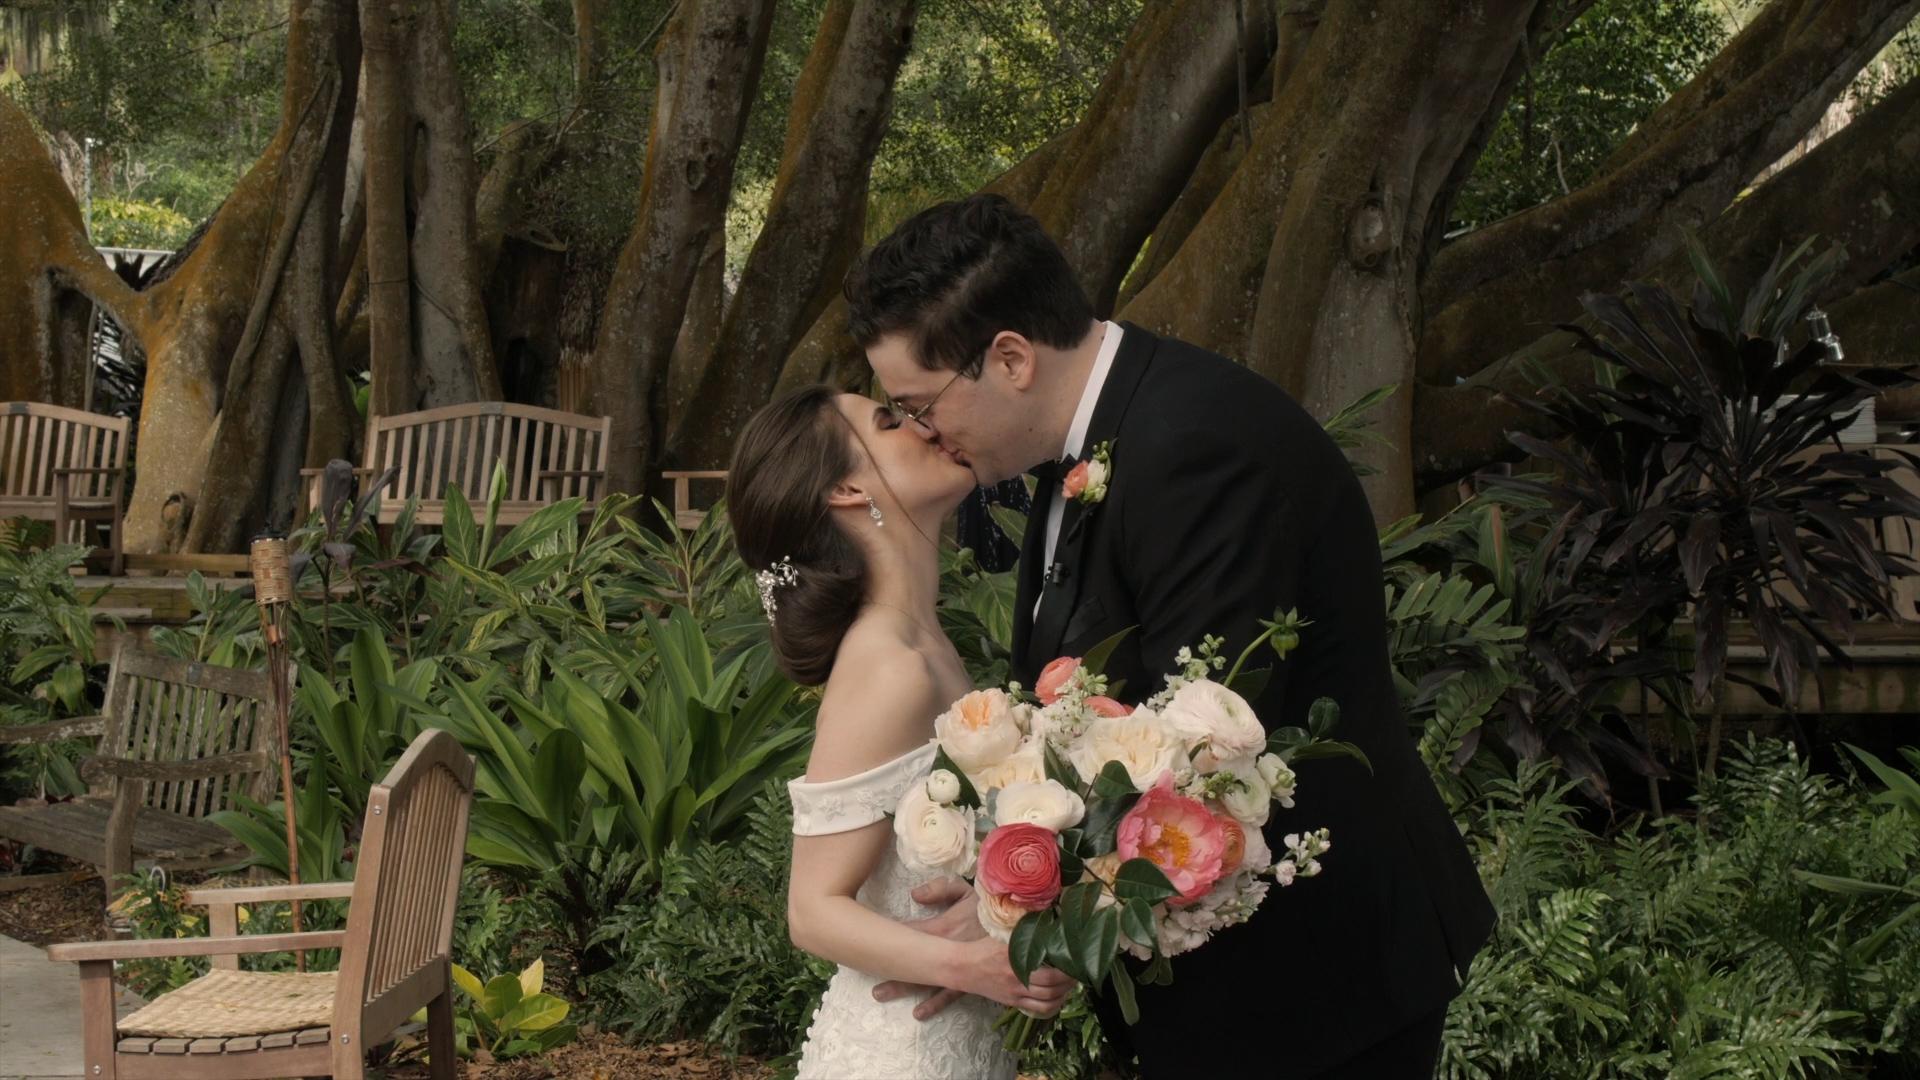 Erica  + Daniel   Sarasota, Florida   Marie Selby Botanical Gardens